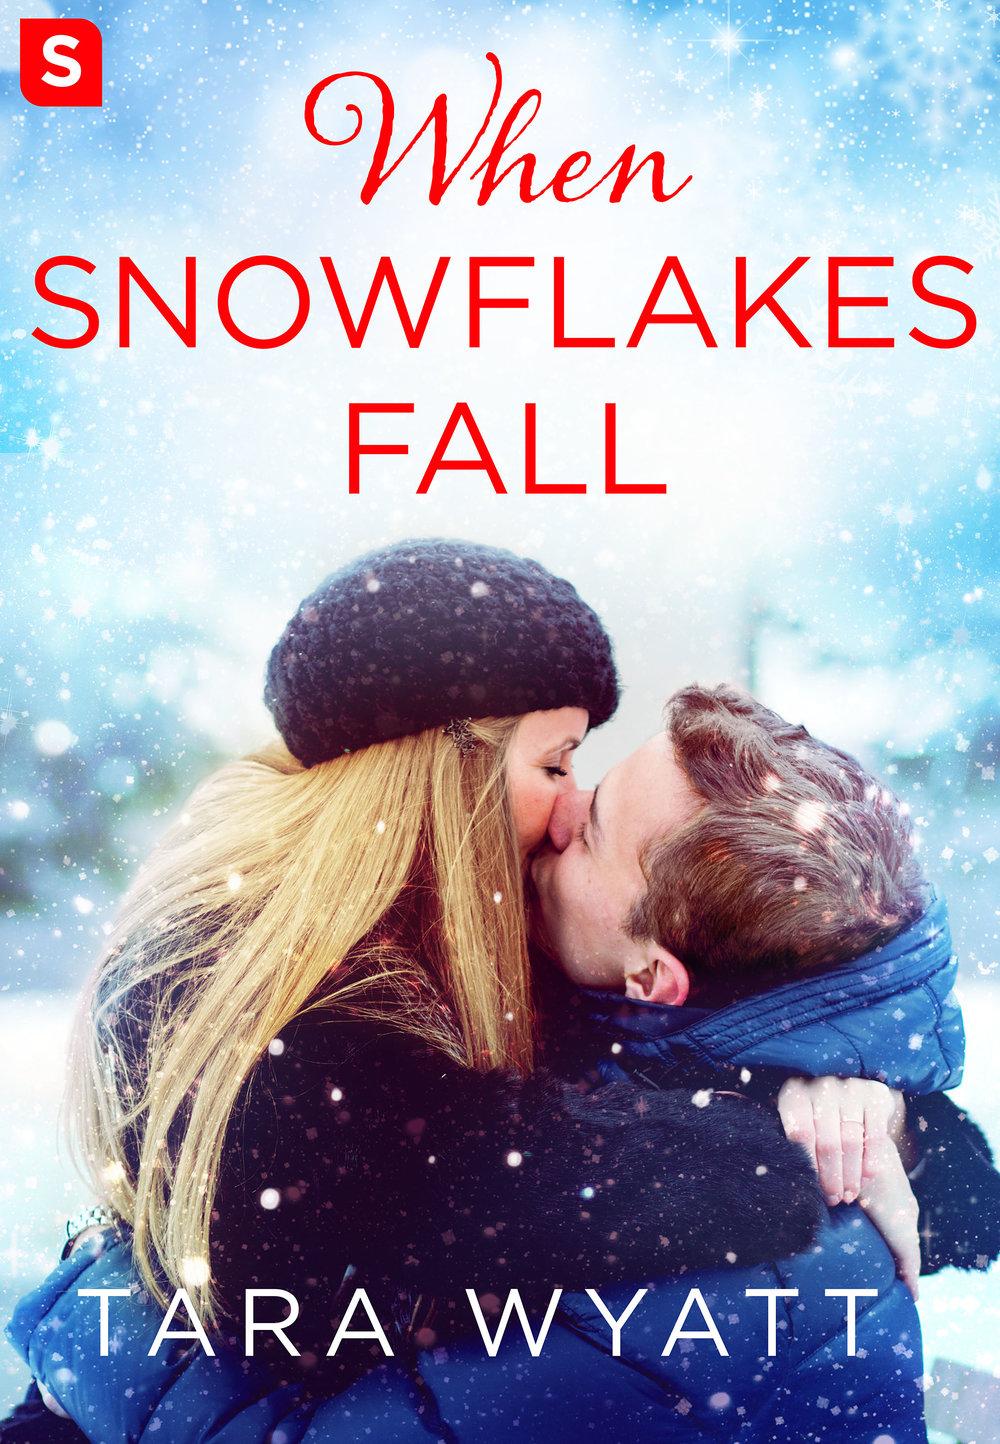 When Snowflakes Fall by Tara Wyatt The Graysons Series Book 1 Holiday Romance